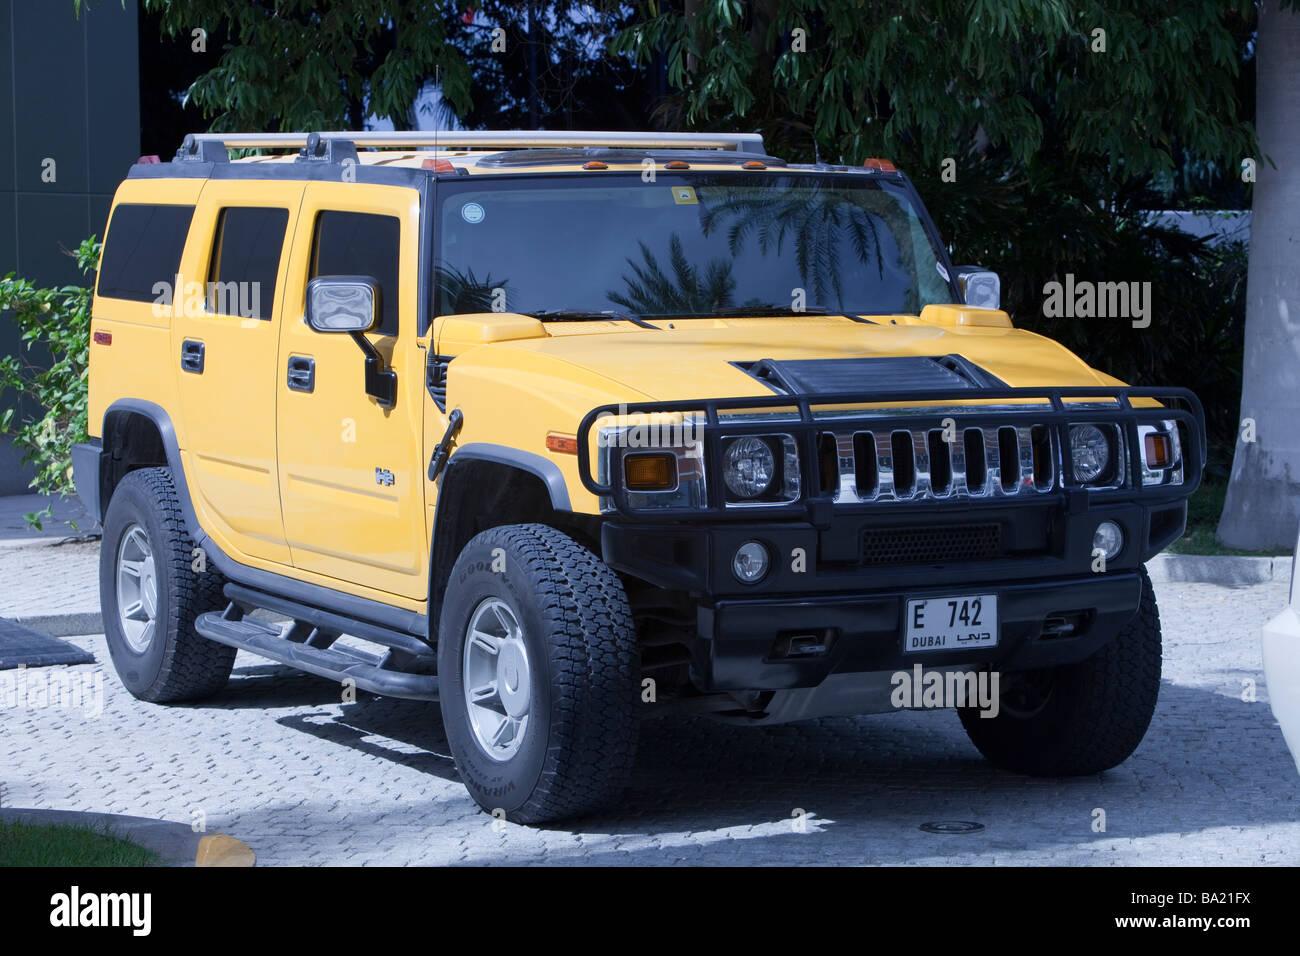 A Hummer in Dubai - Stock Image